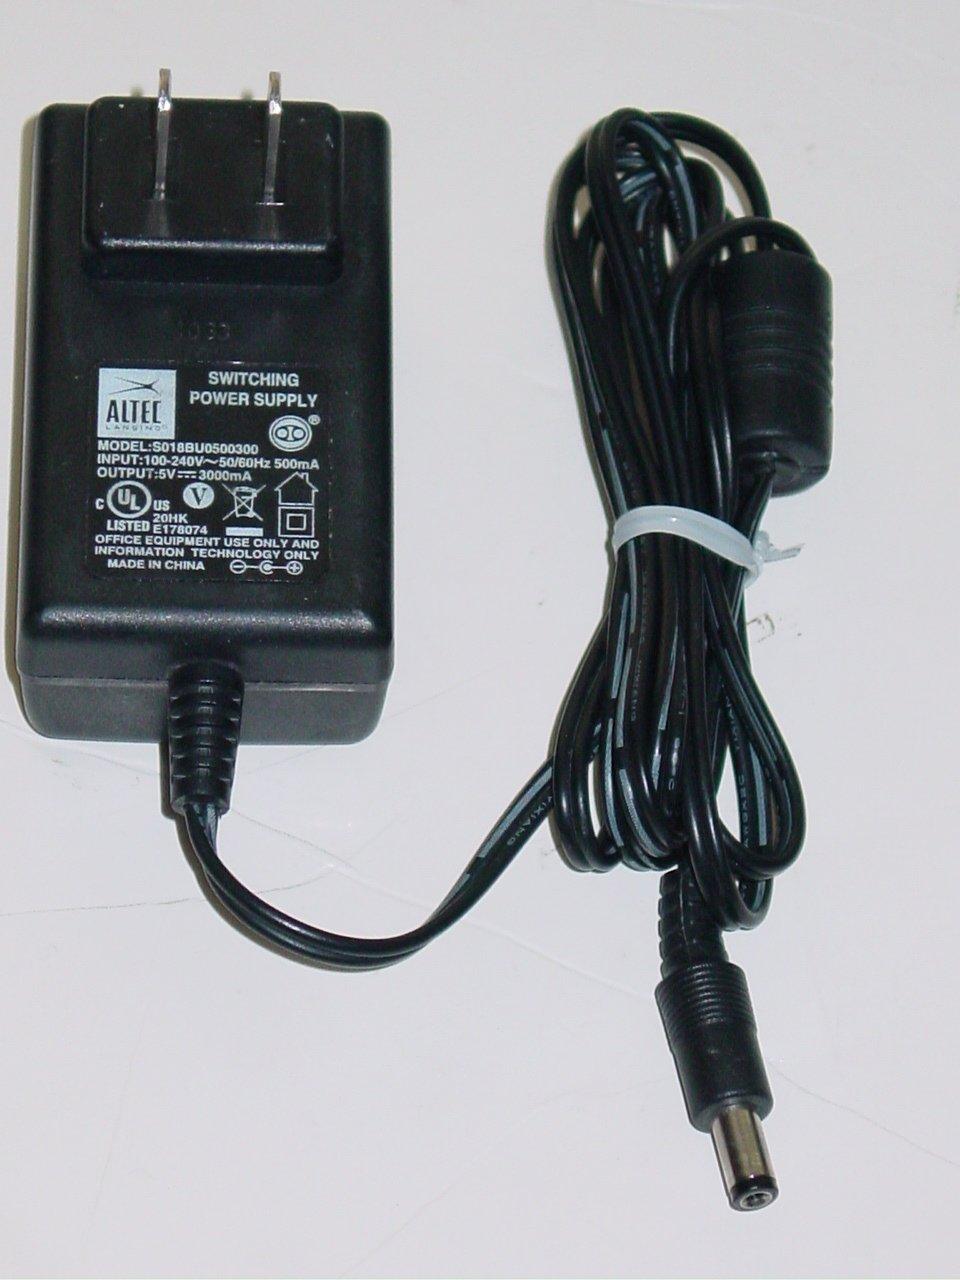 Altec Lansing S018BU0500300 AC Adapter 5V 3000mA